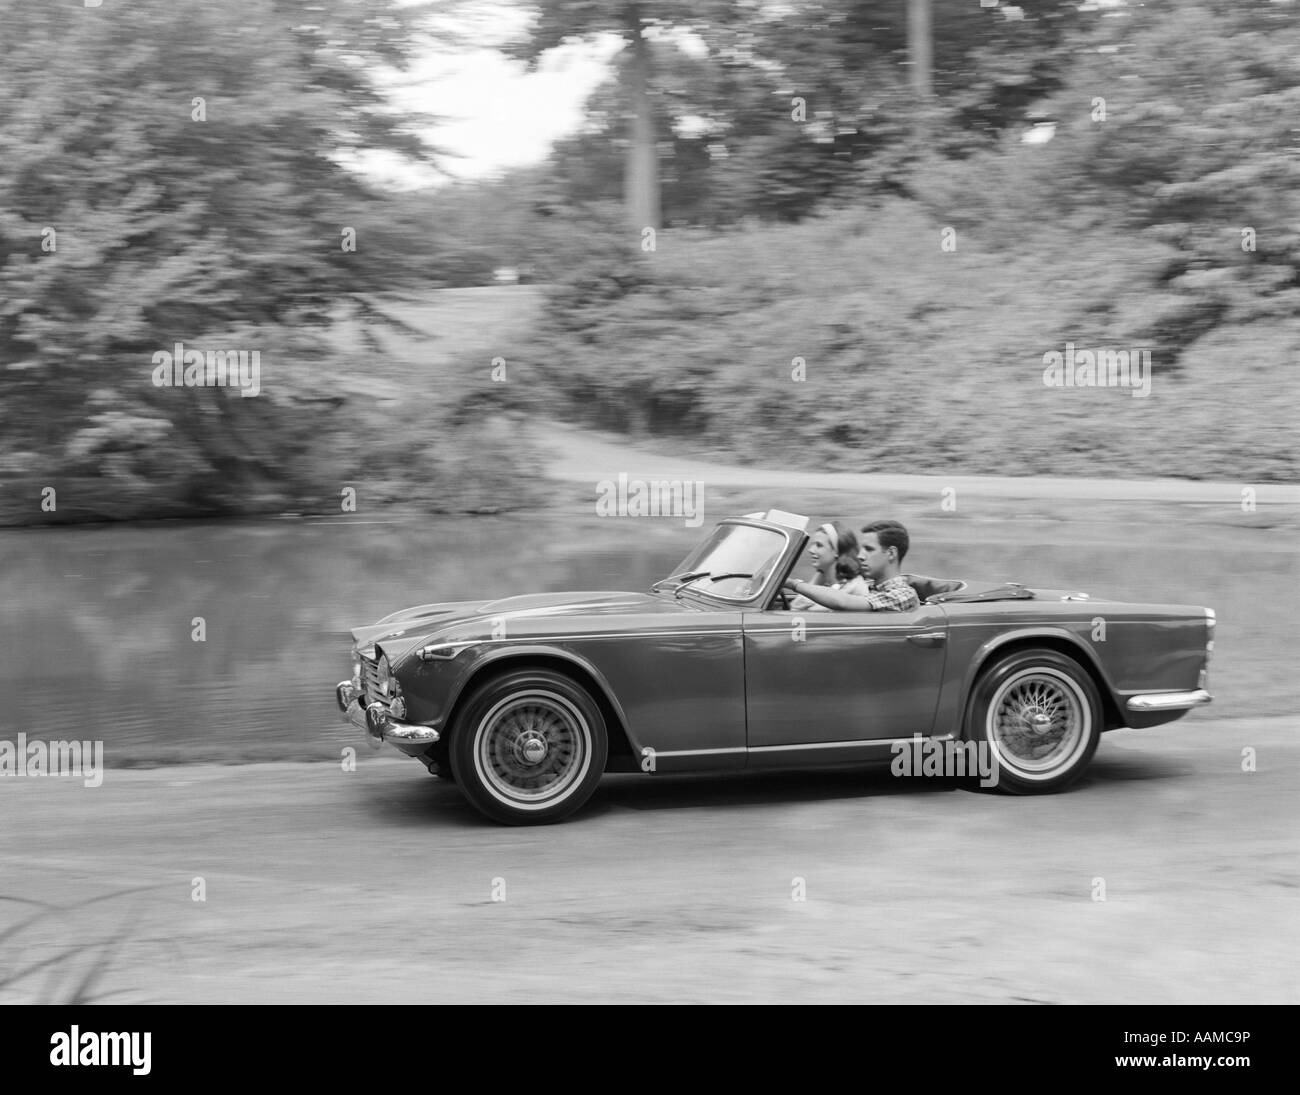 1966 Jaguar Xke Convertible: British Sports Cars 1960s Stock Photos & British Sports